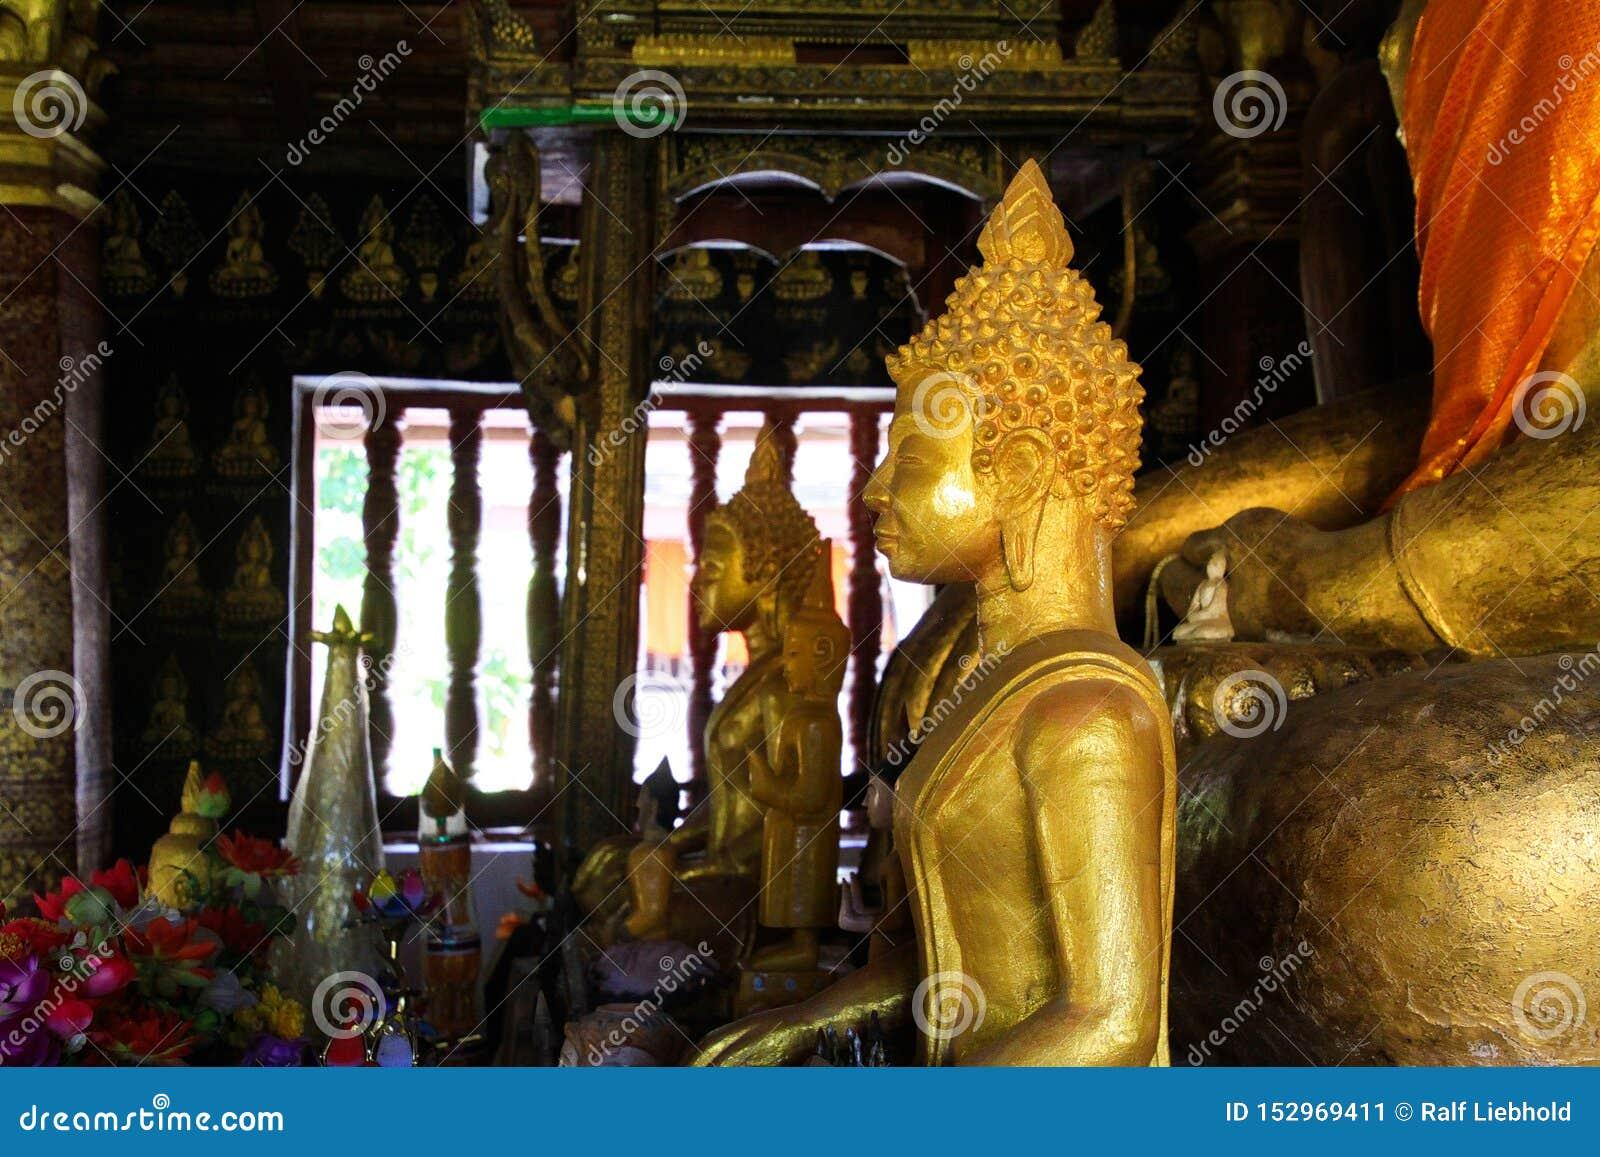 LUANG PRABANG WAT XIENG THONG, LAOS - DECEMBER 17. 2017: Buddha statues inside temple illuminated by natural sunlight